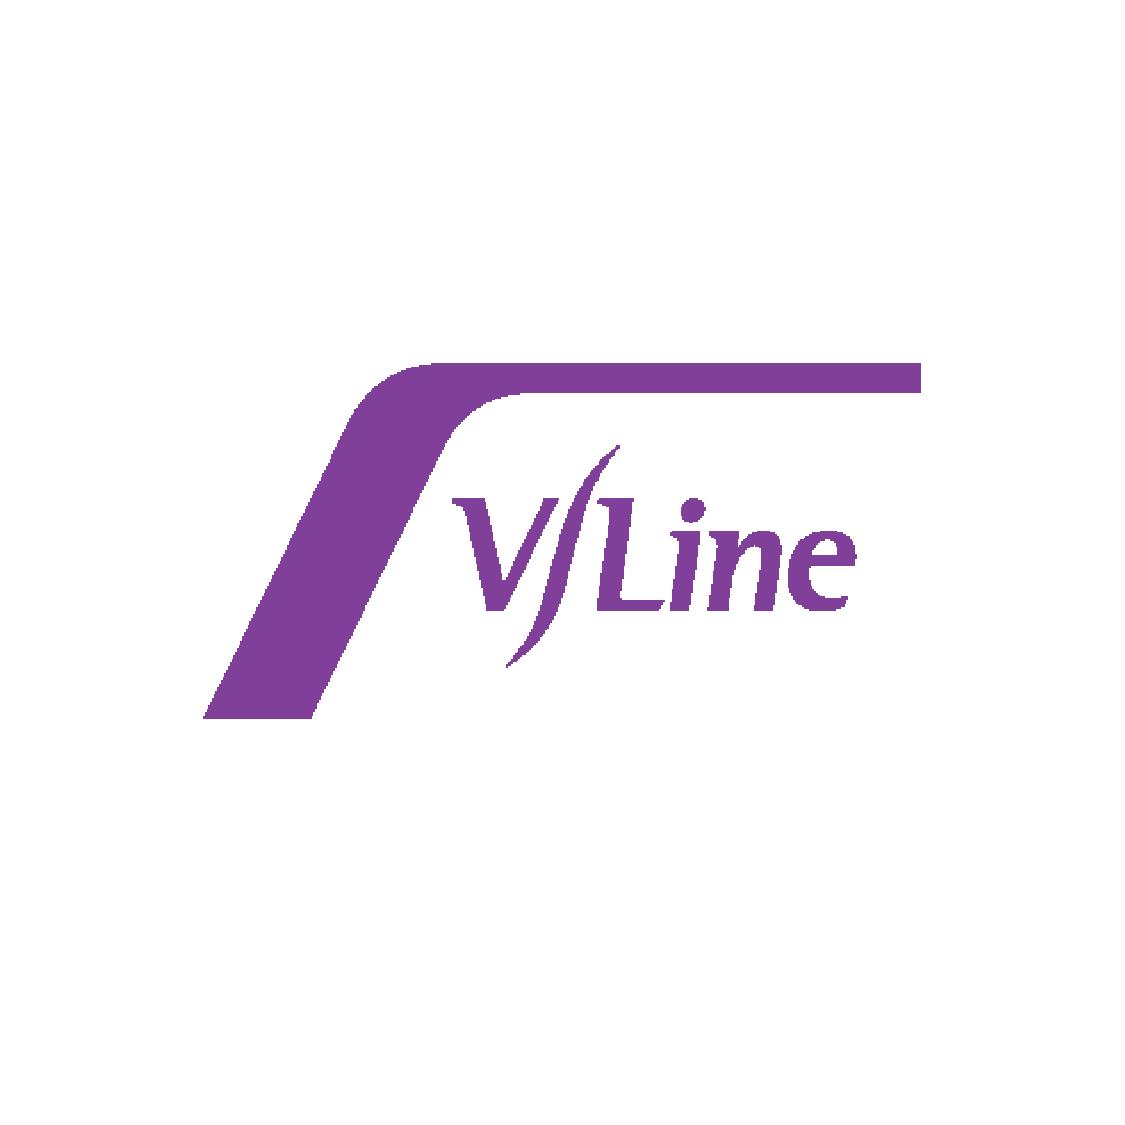 vline-01